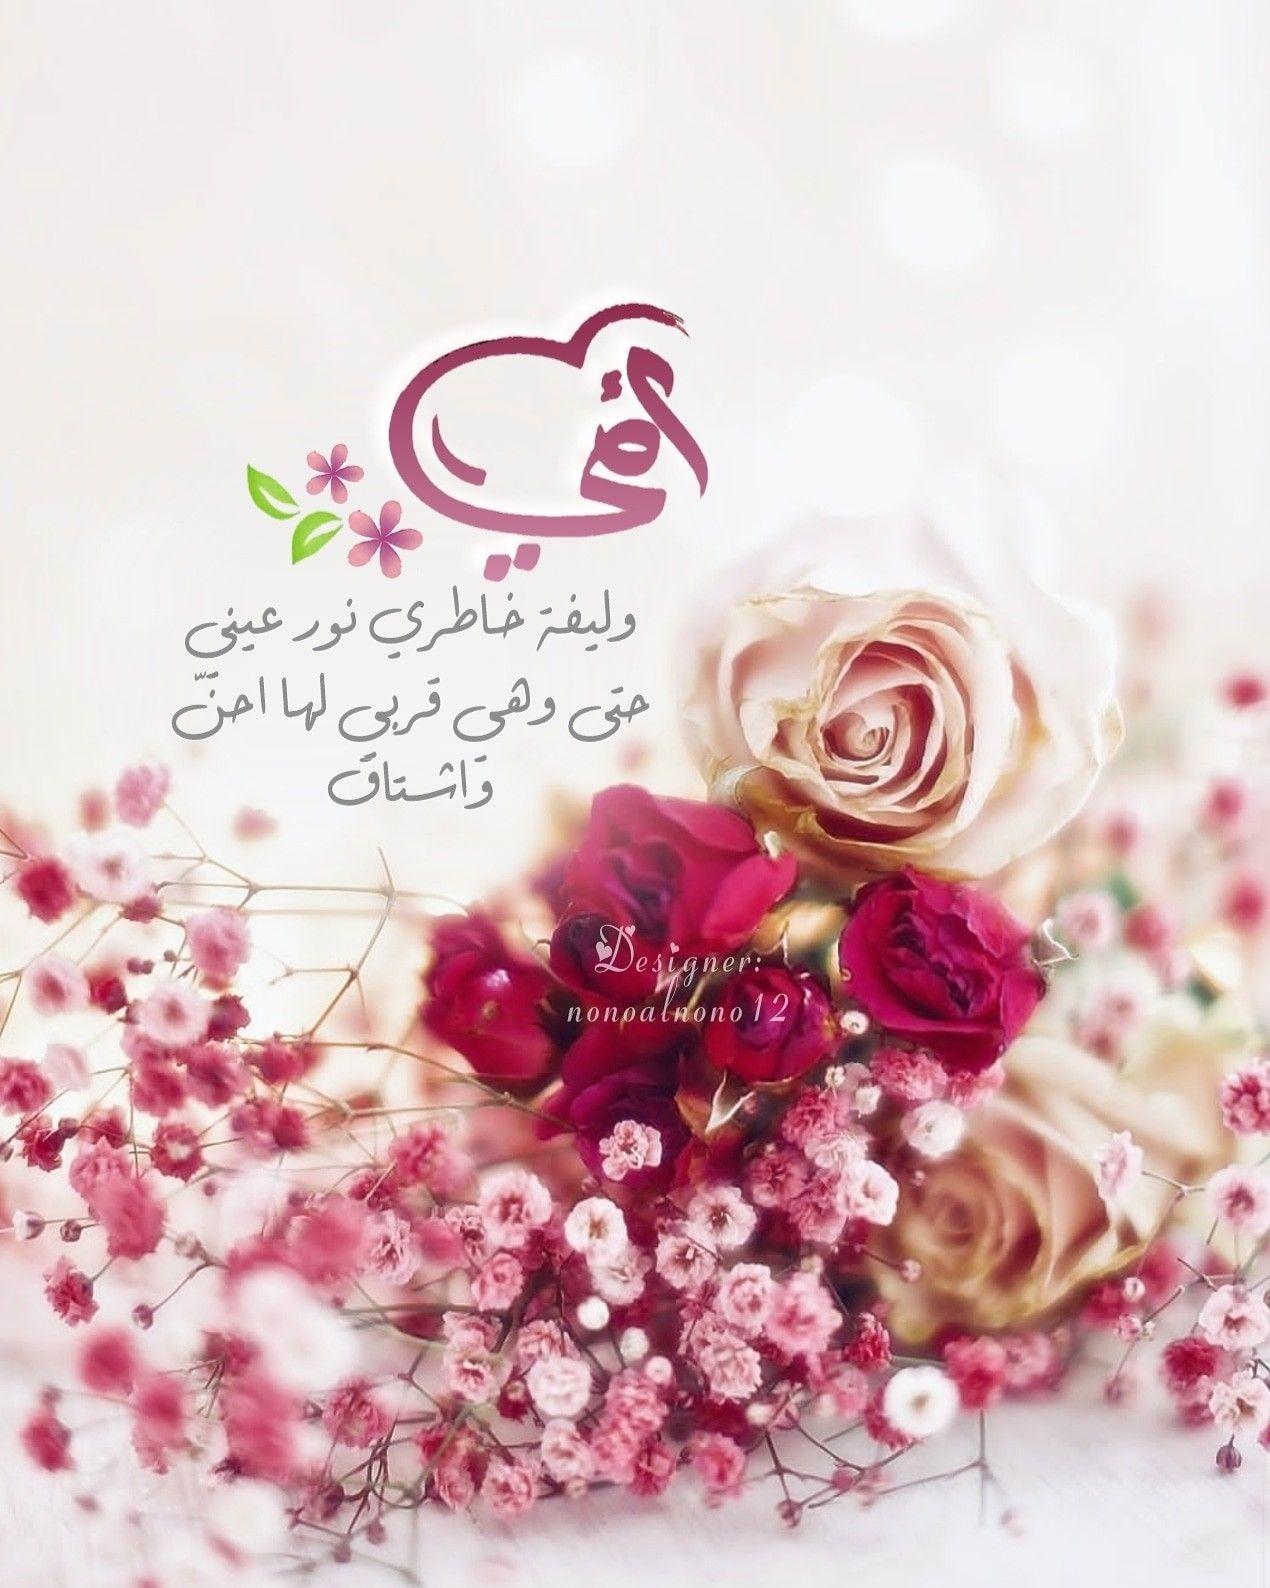 Pin By رمزيات إسلامية On ادعية Happy Eid Happy Mothers Arabic Quotes